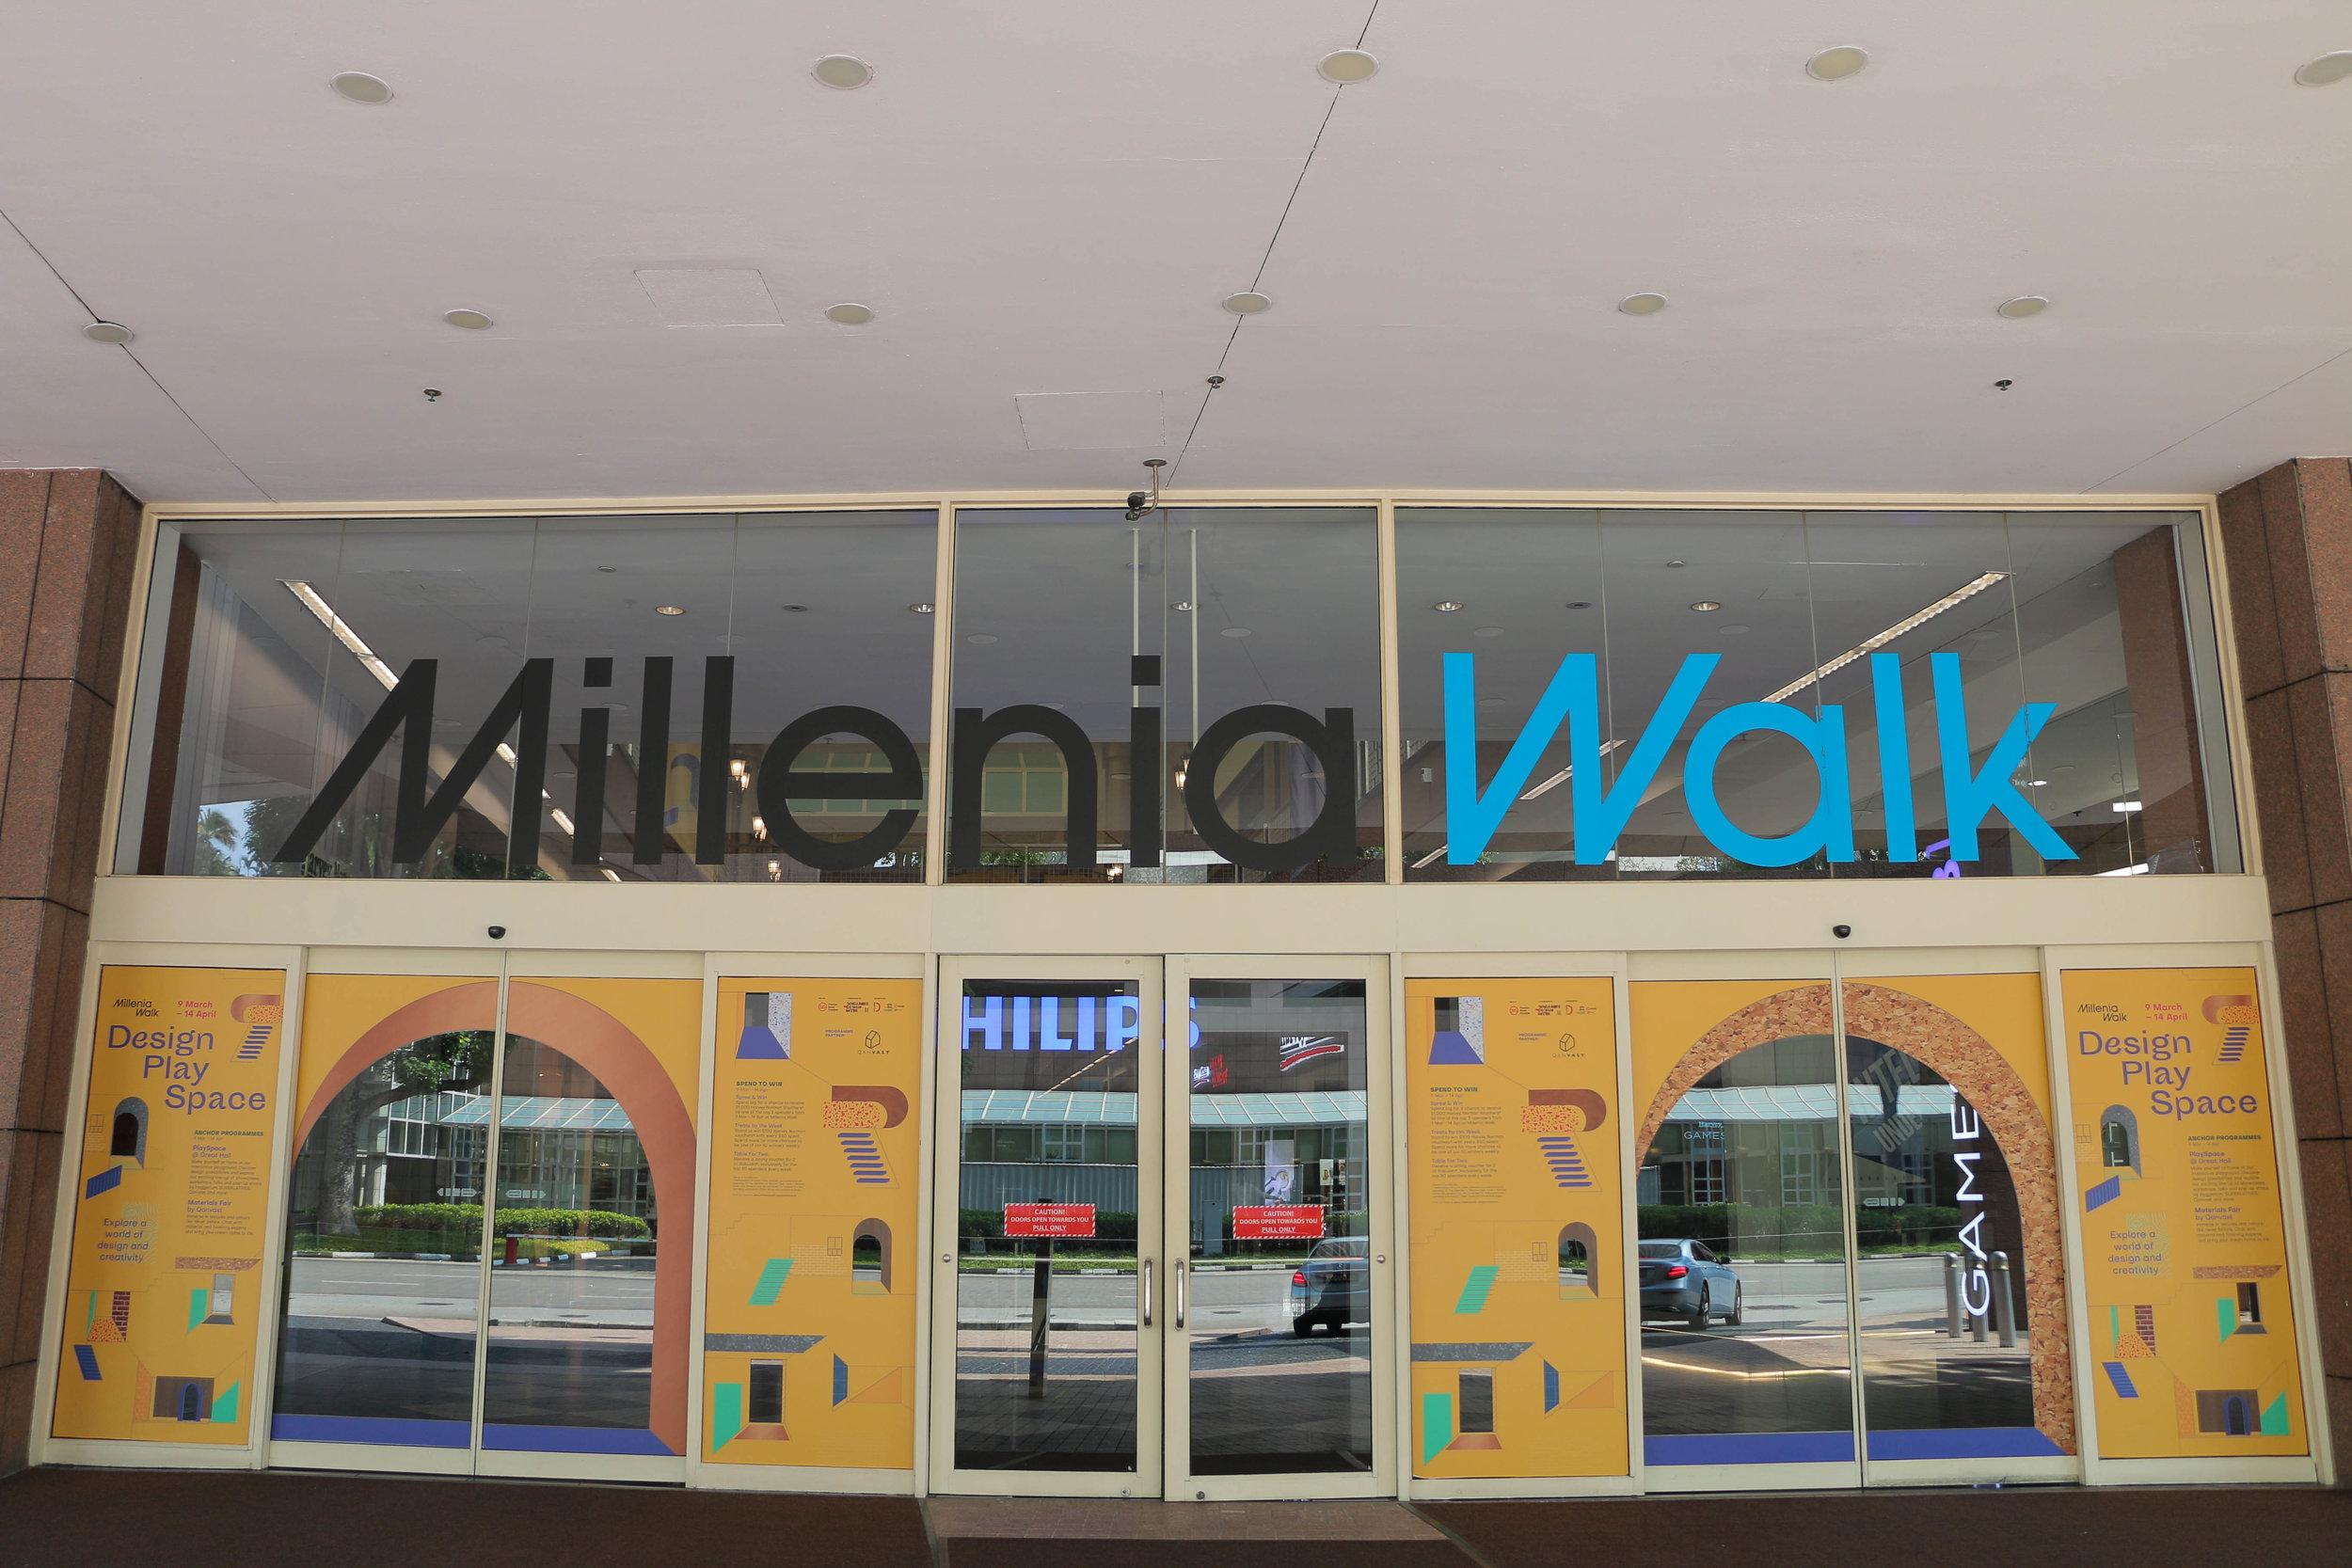 outeredit - millenia walk design play space - doors